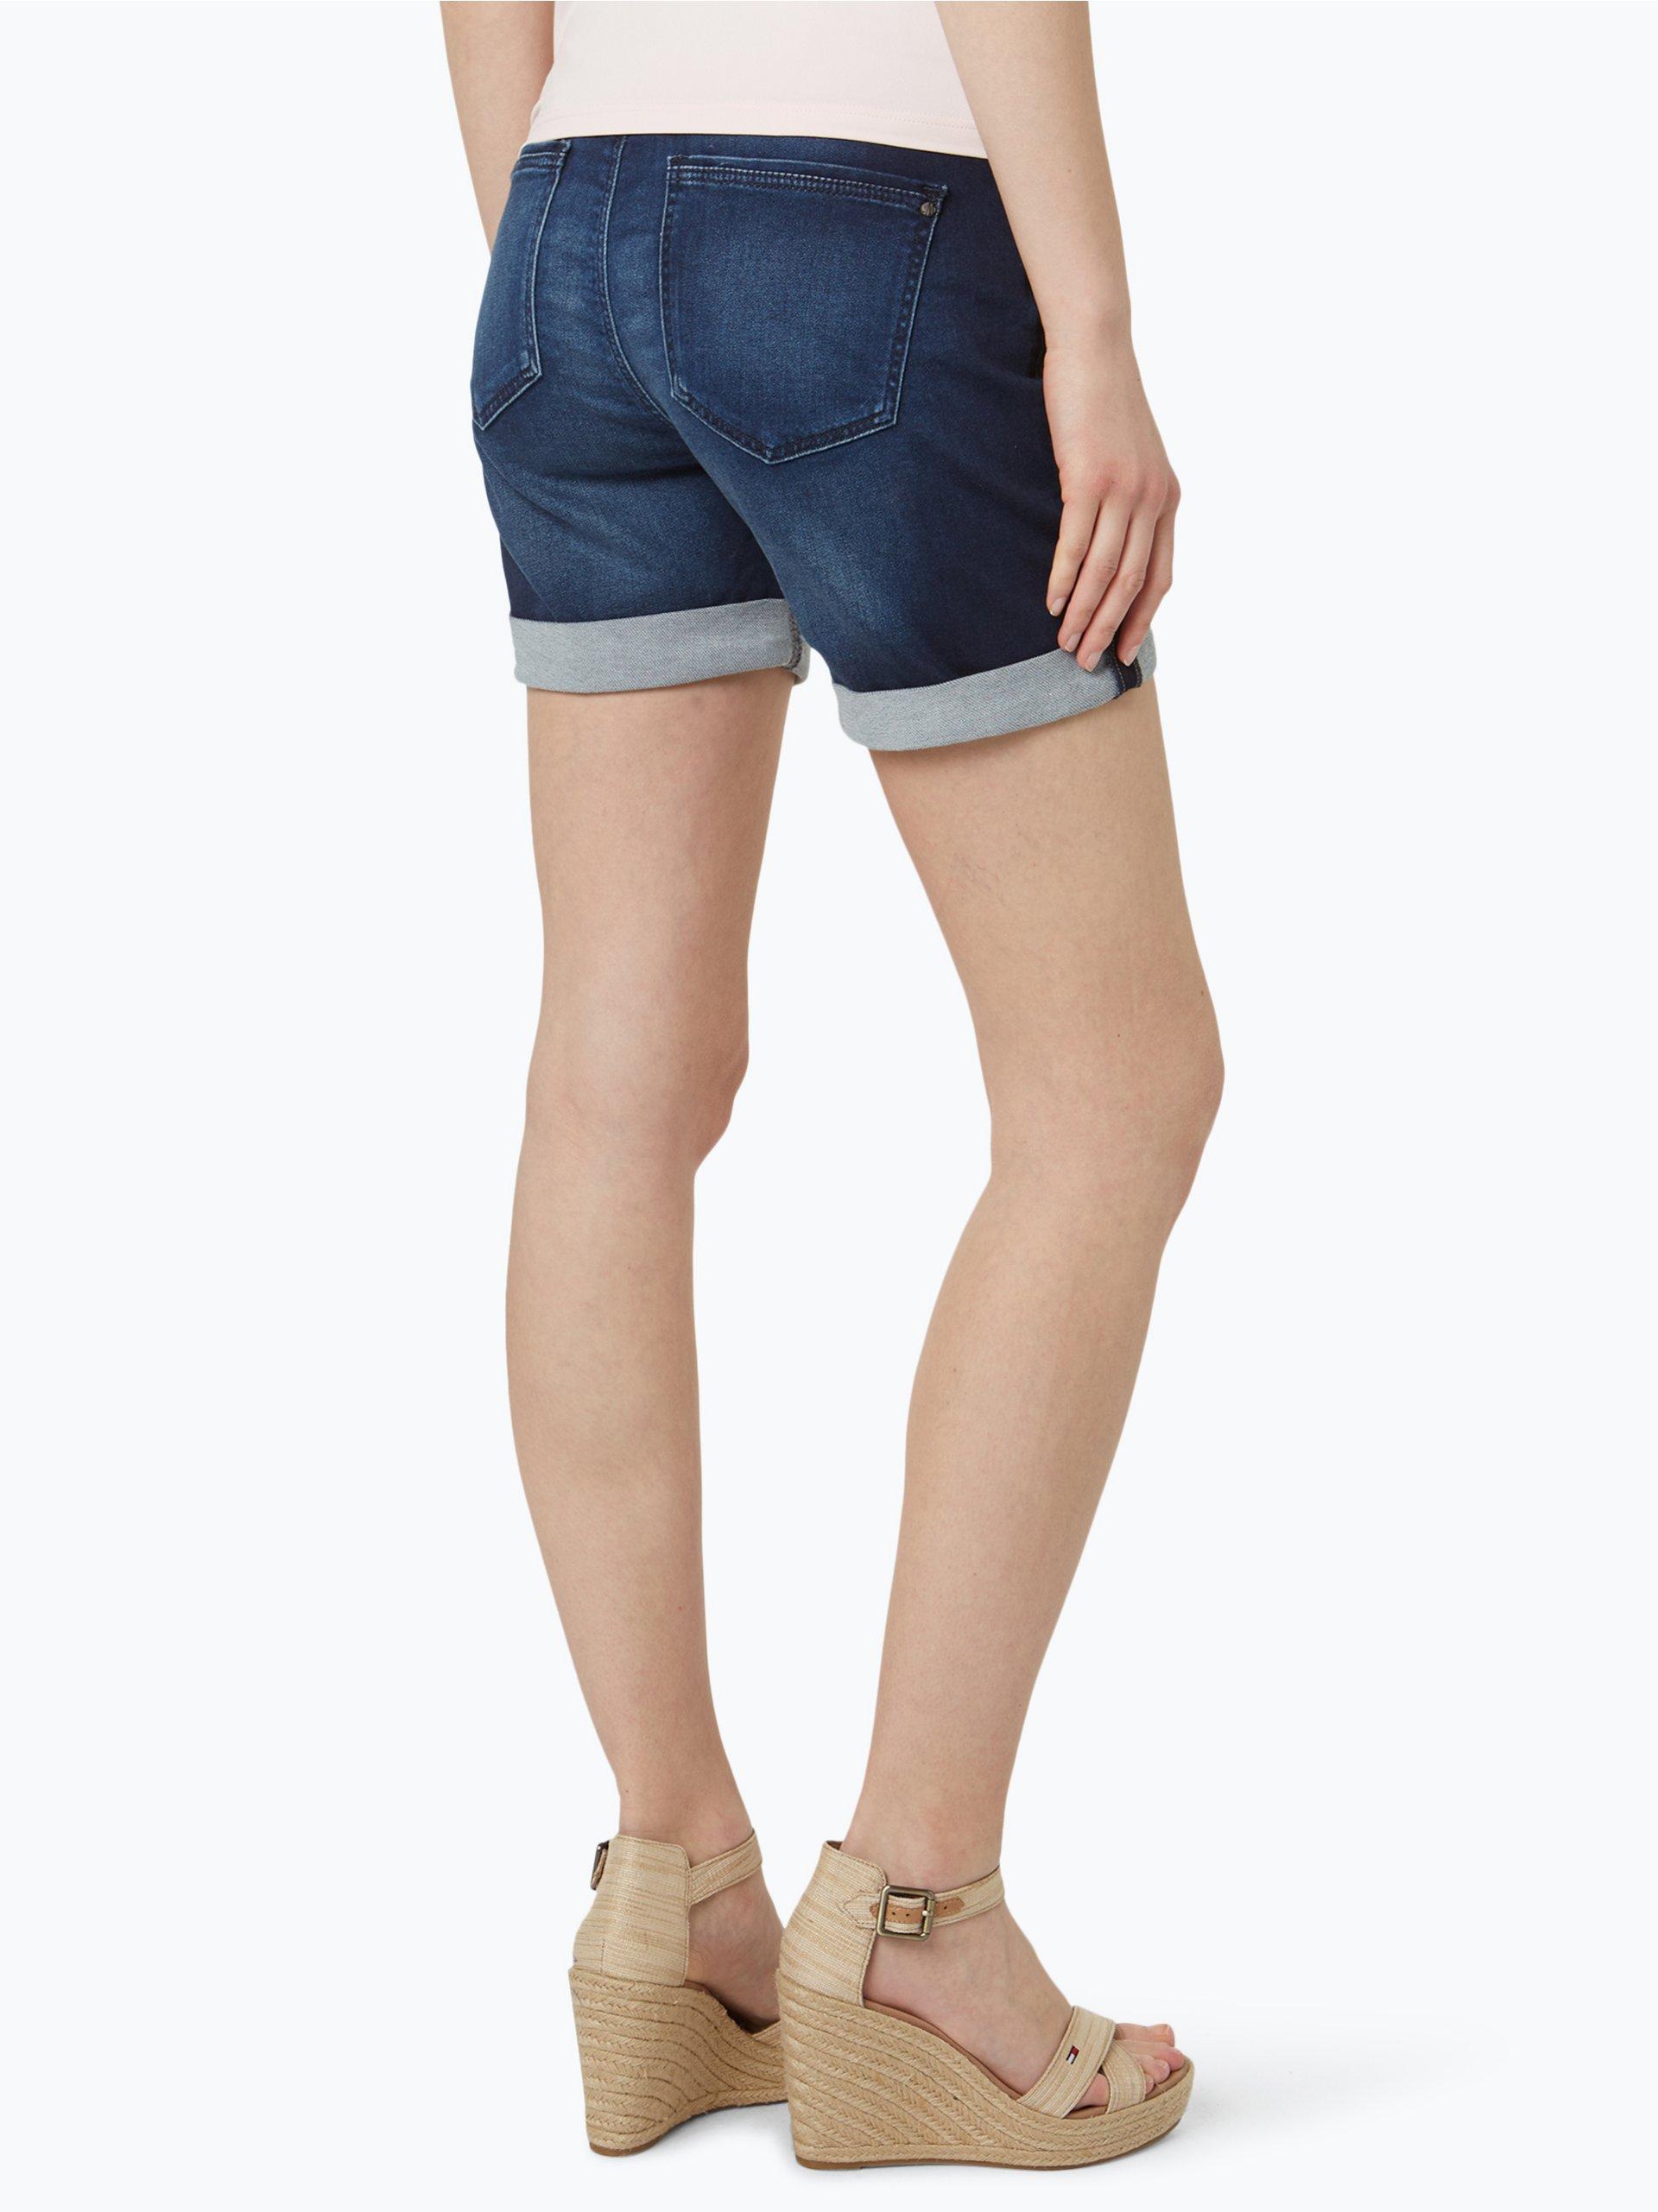 mavi damen jeans shorts camilla dark stone uni online kaufen peek und cloppenburg de. Black Bedroom Furniture Sets. Home Design Ideas